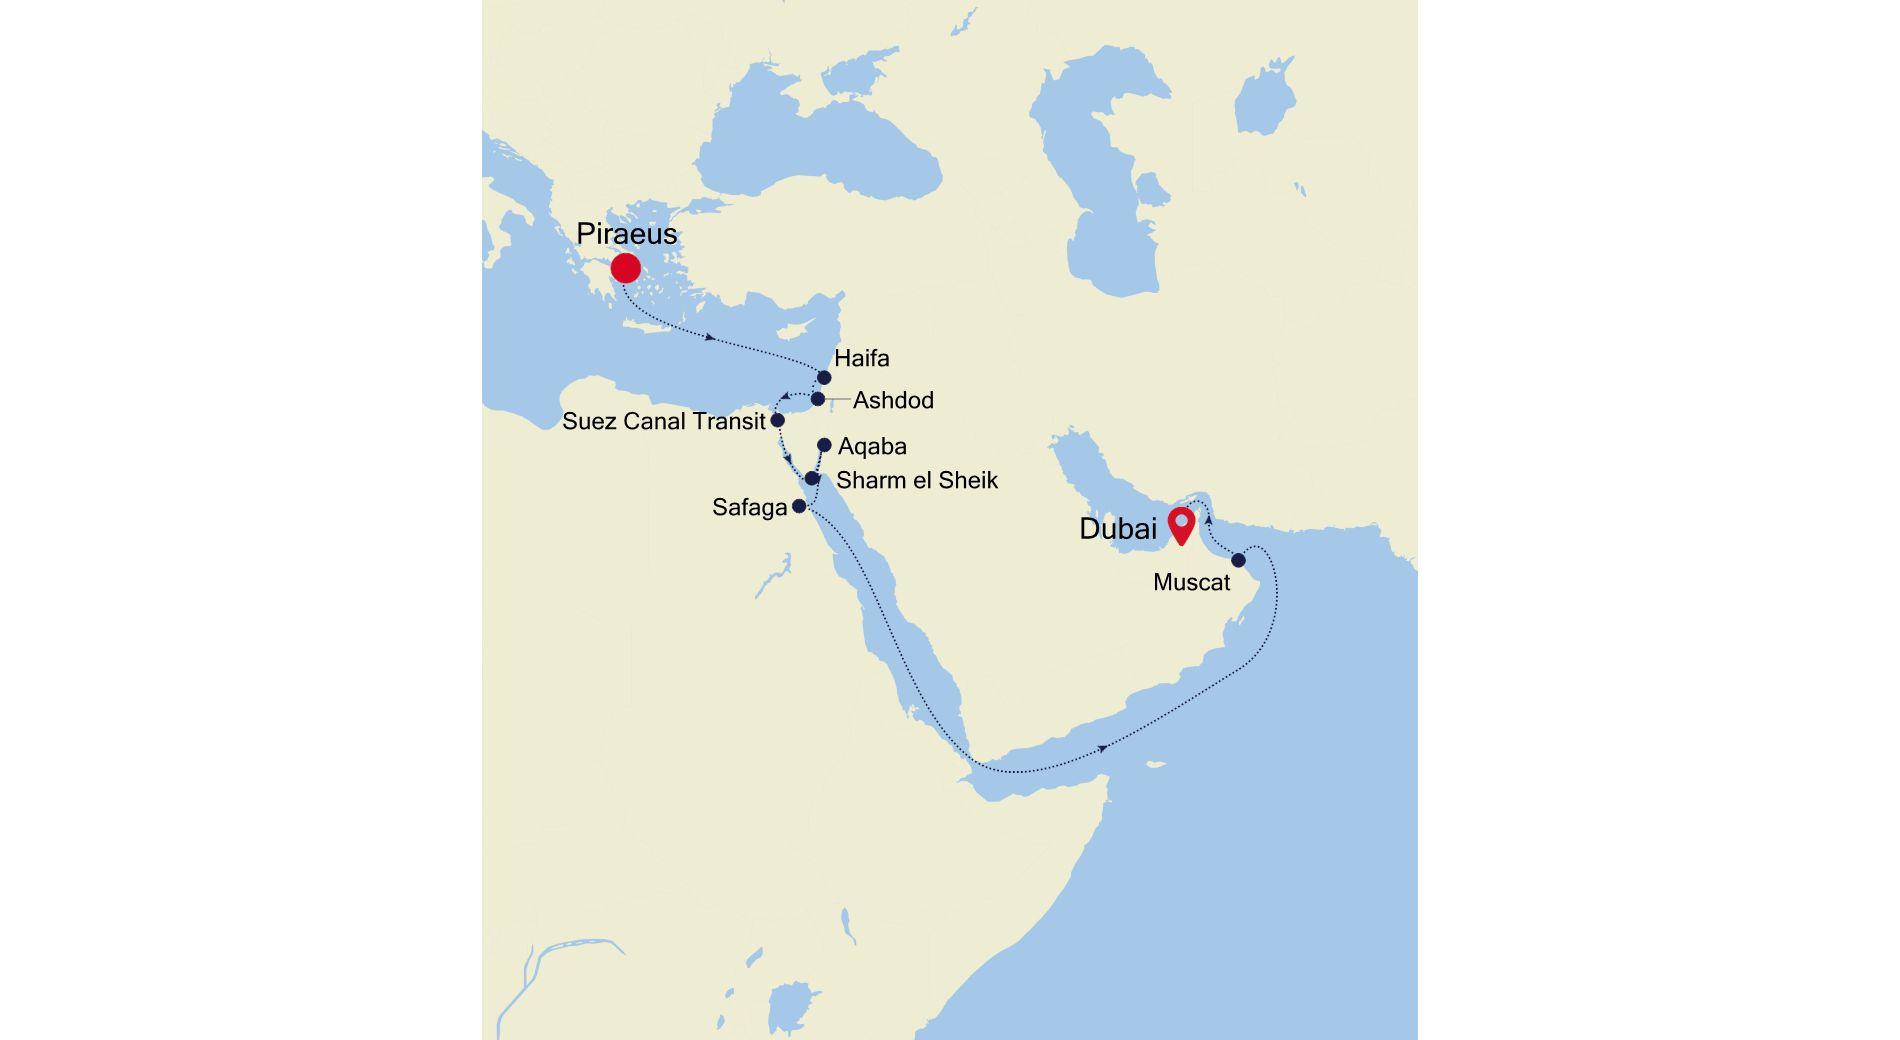 SL201105017 - Piraeus a Dubai